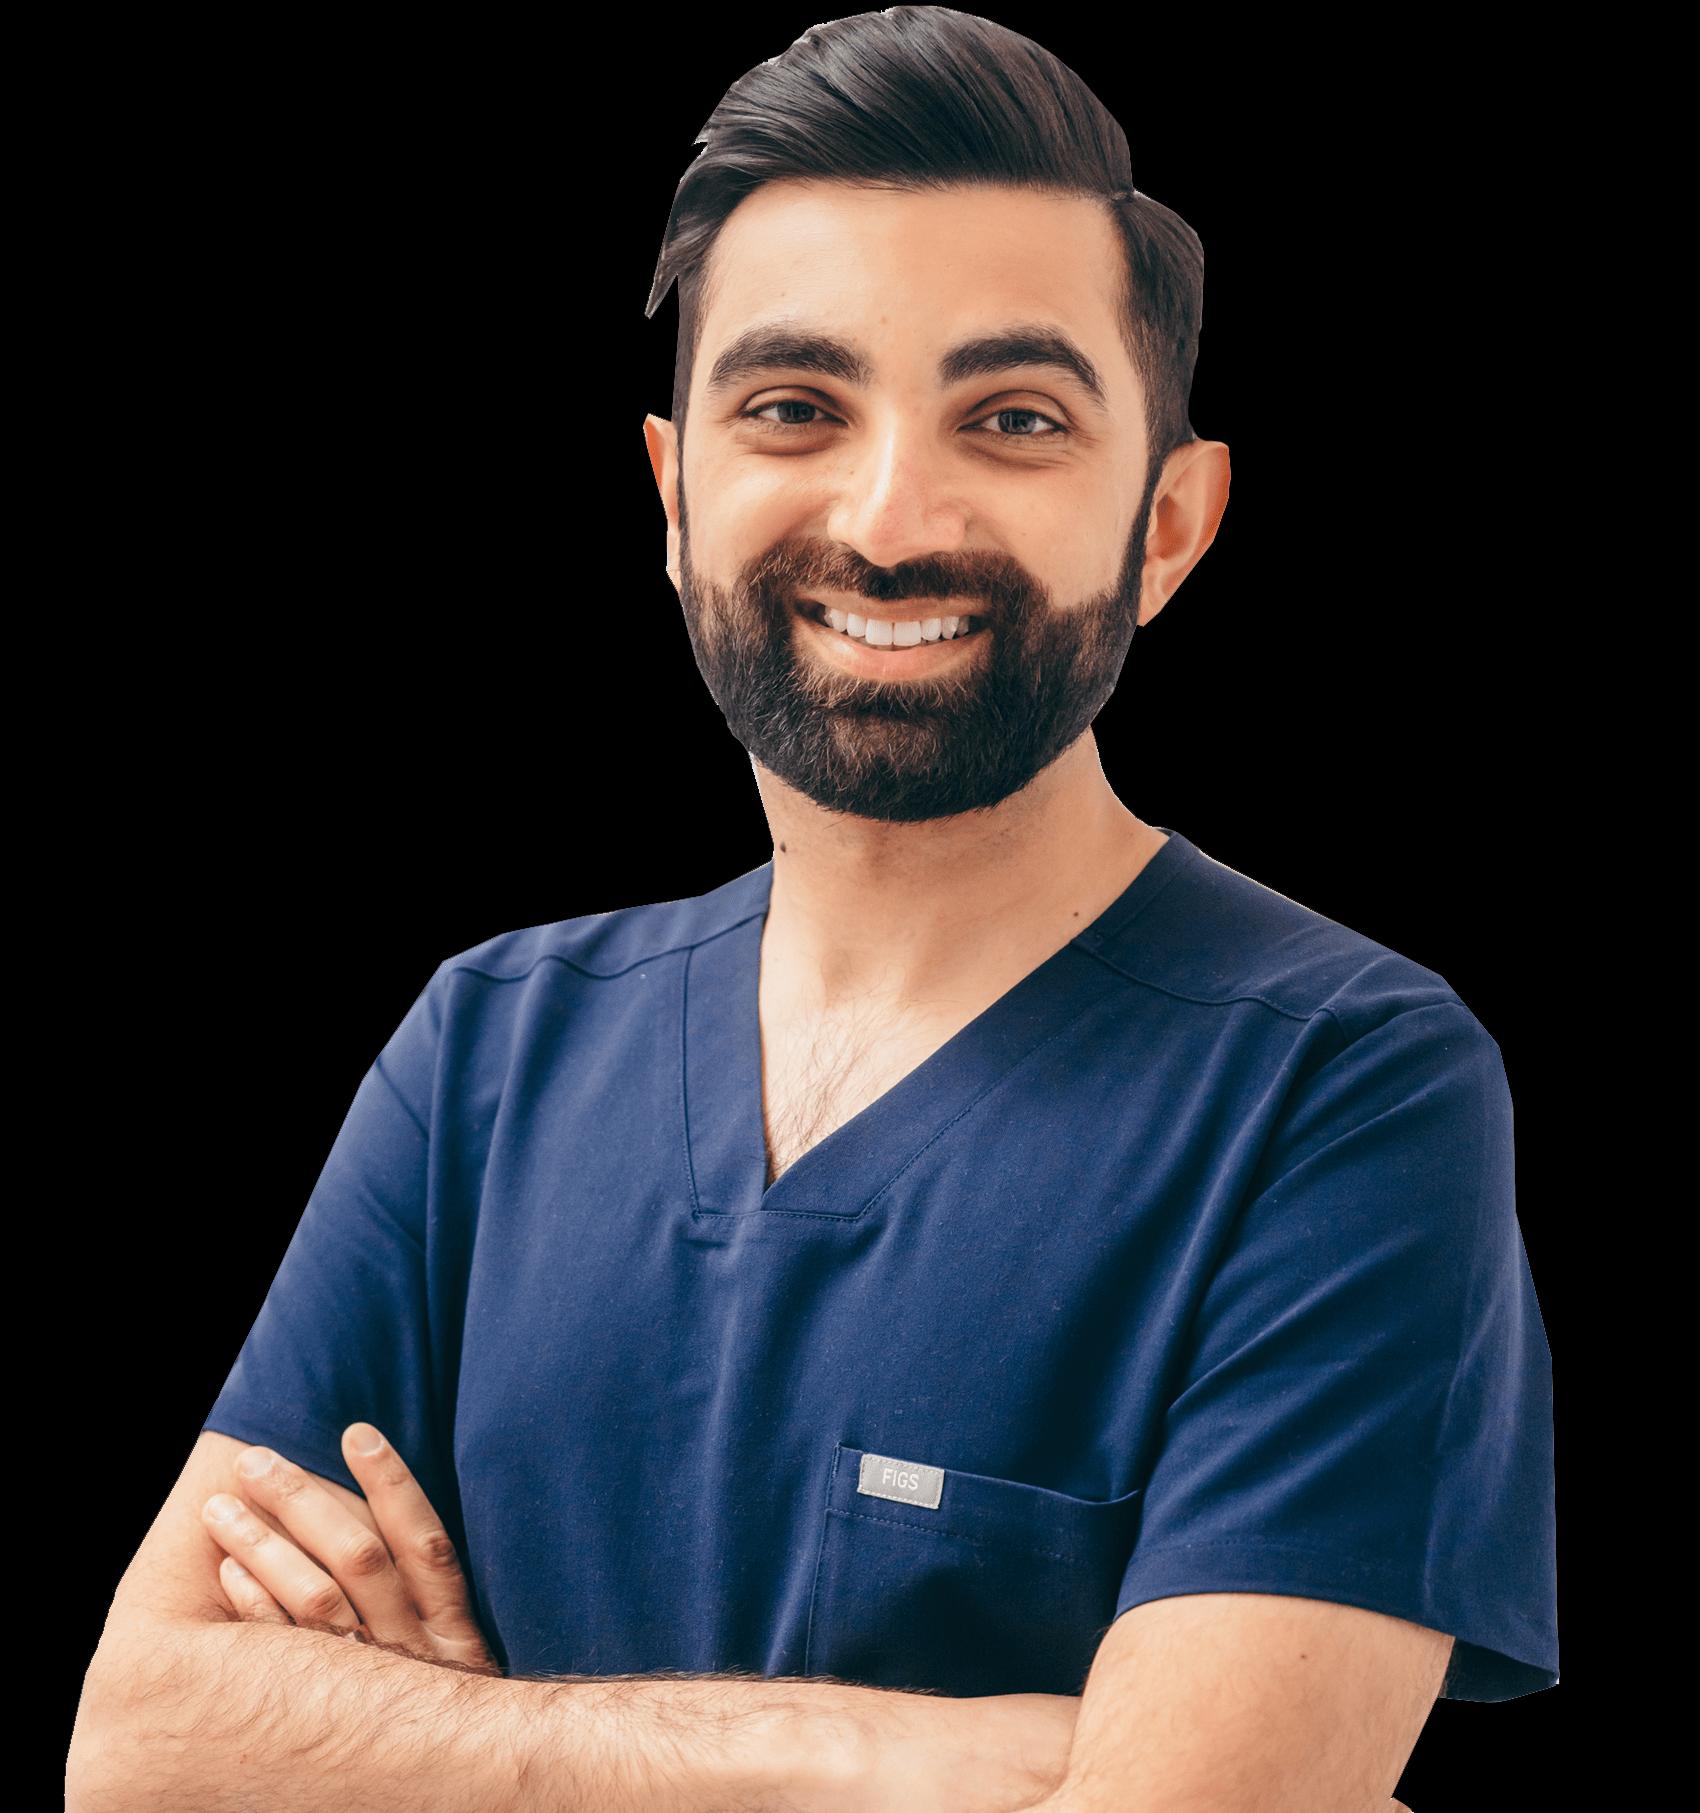 Dr. Hiten Halai